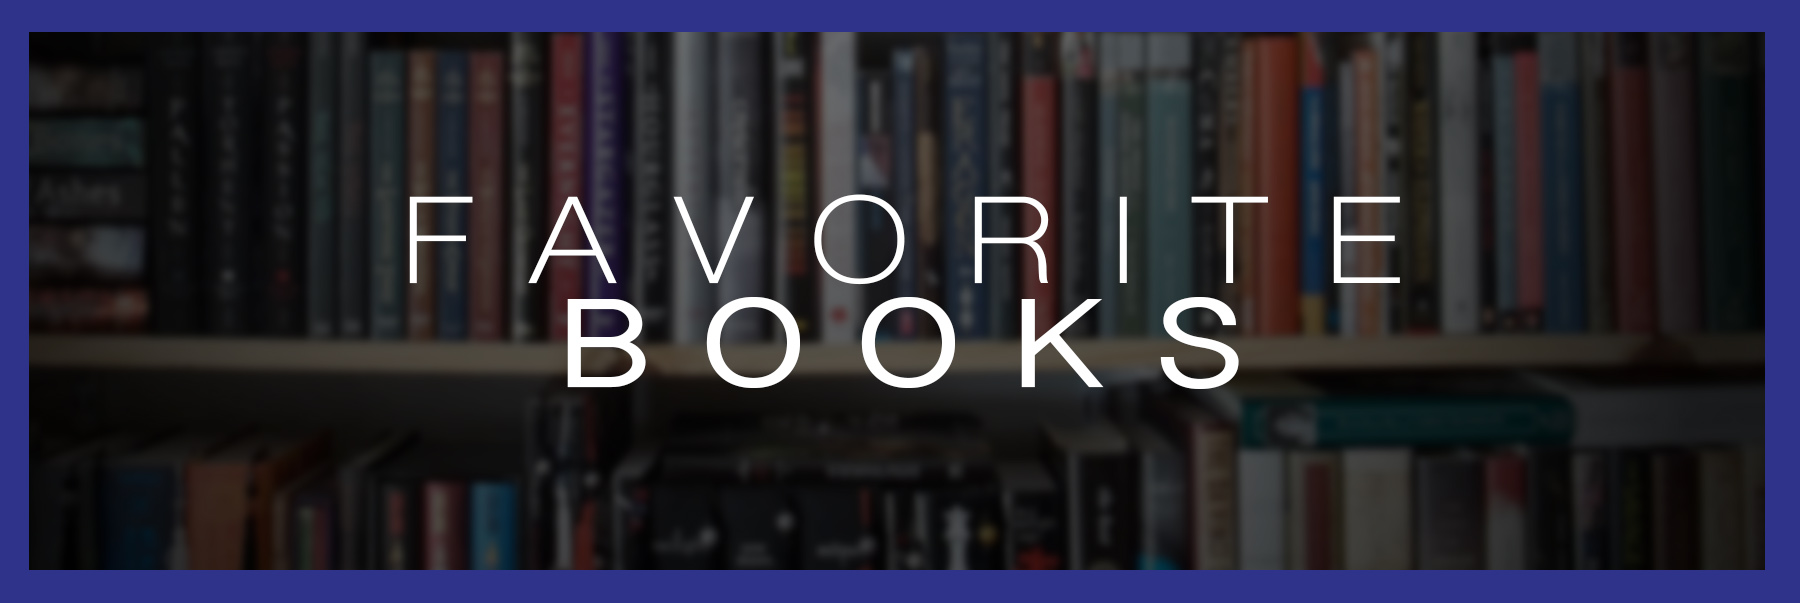 favorite books.jpg